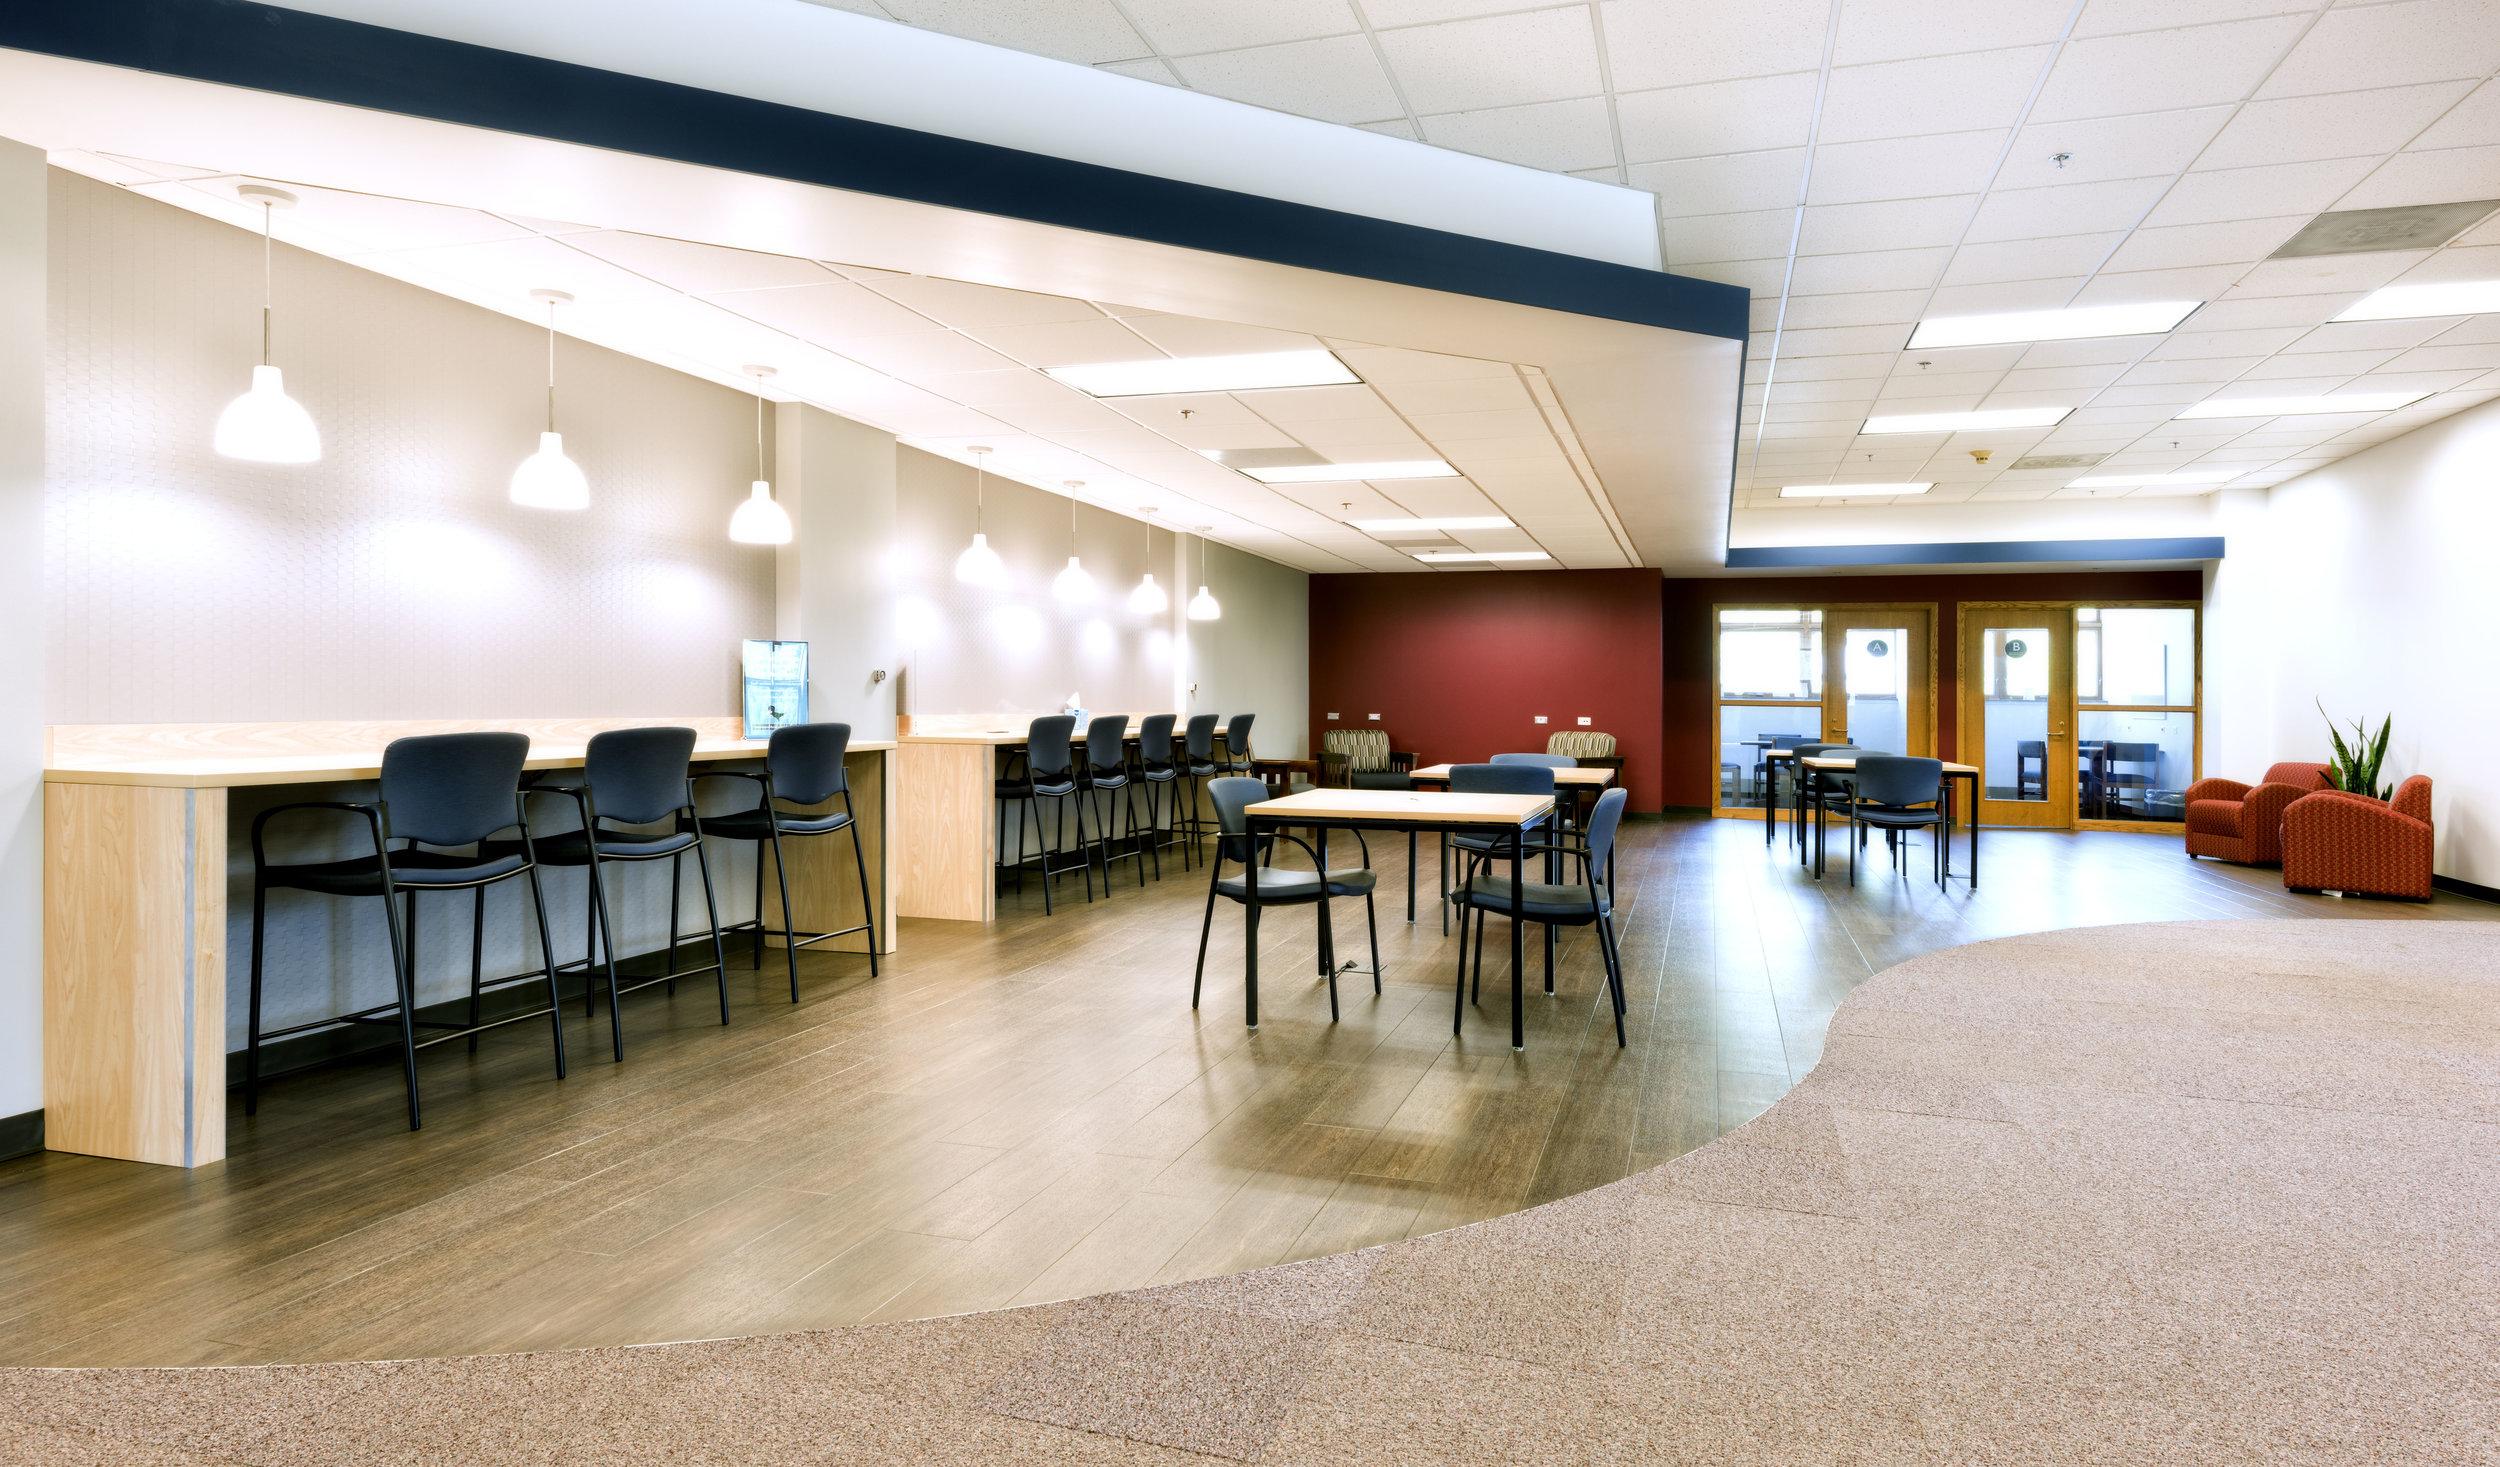 westmont public library